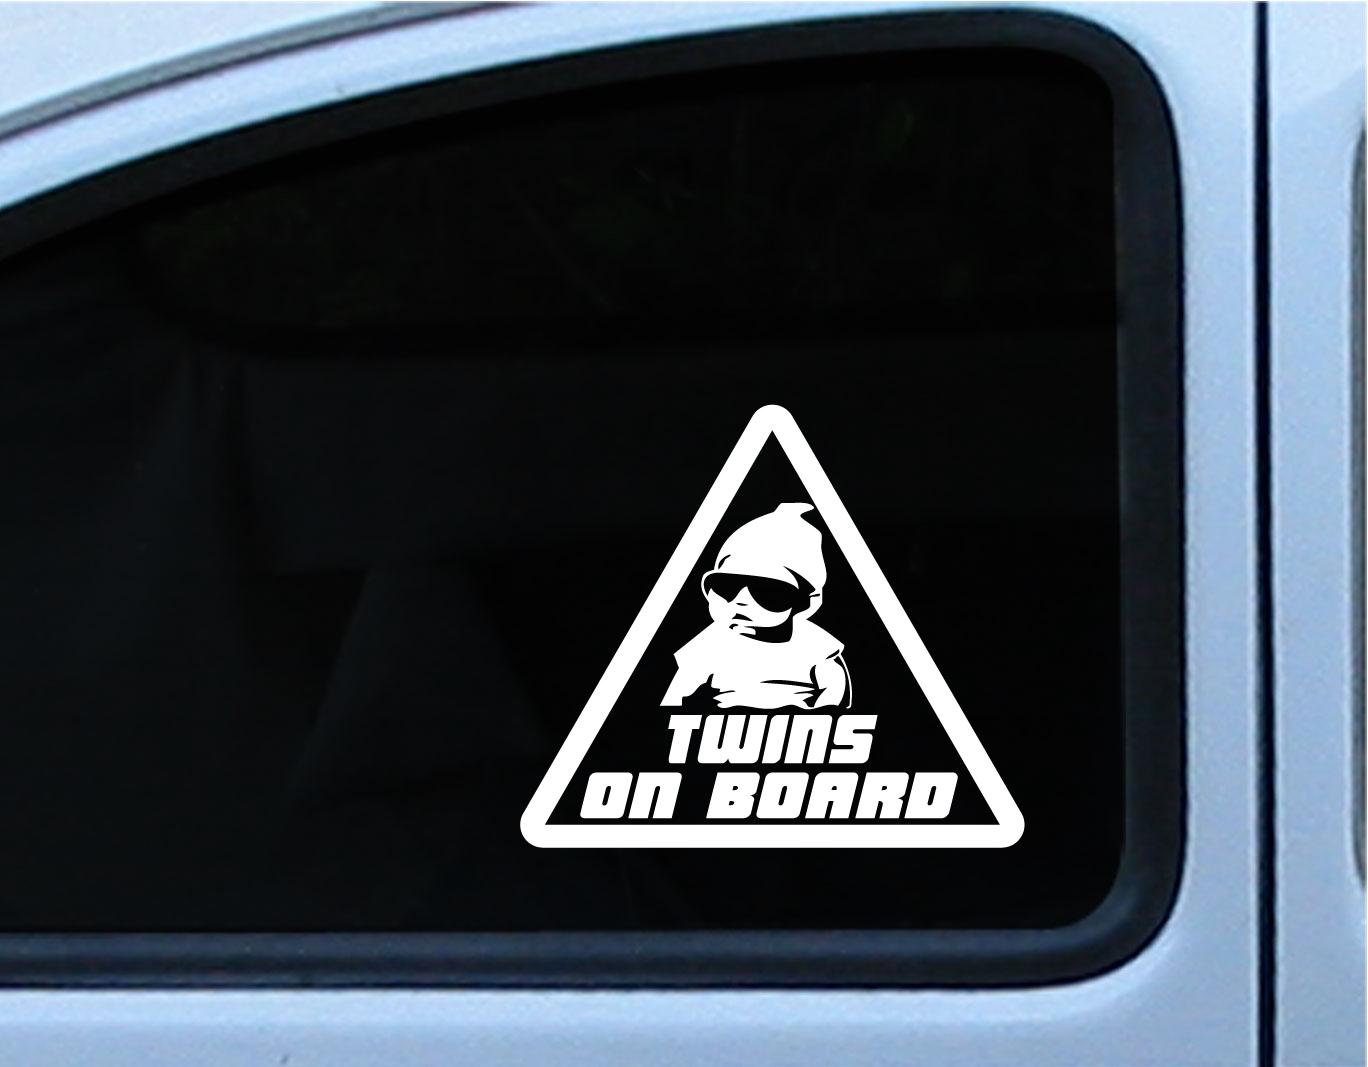 TWINS BABY ON BOARD Carlos Hangover Die Cut Vinyl Decal Sticker - Die cut vinyl decal stickers